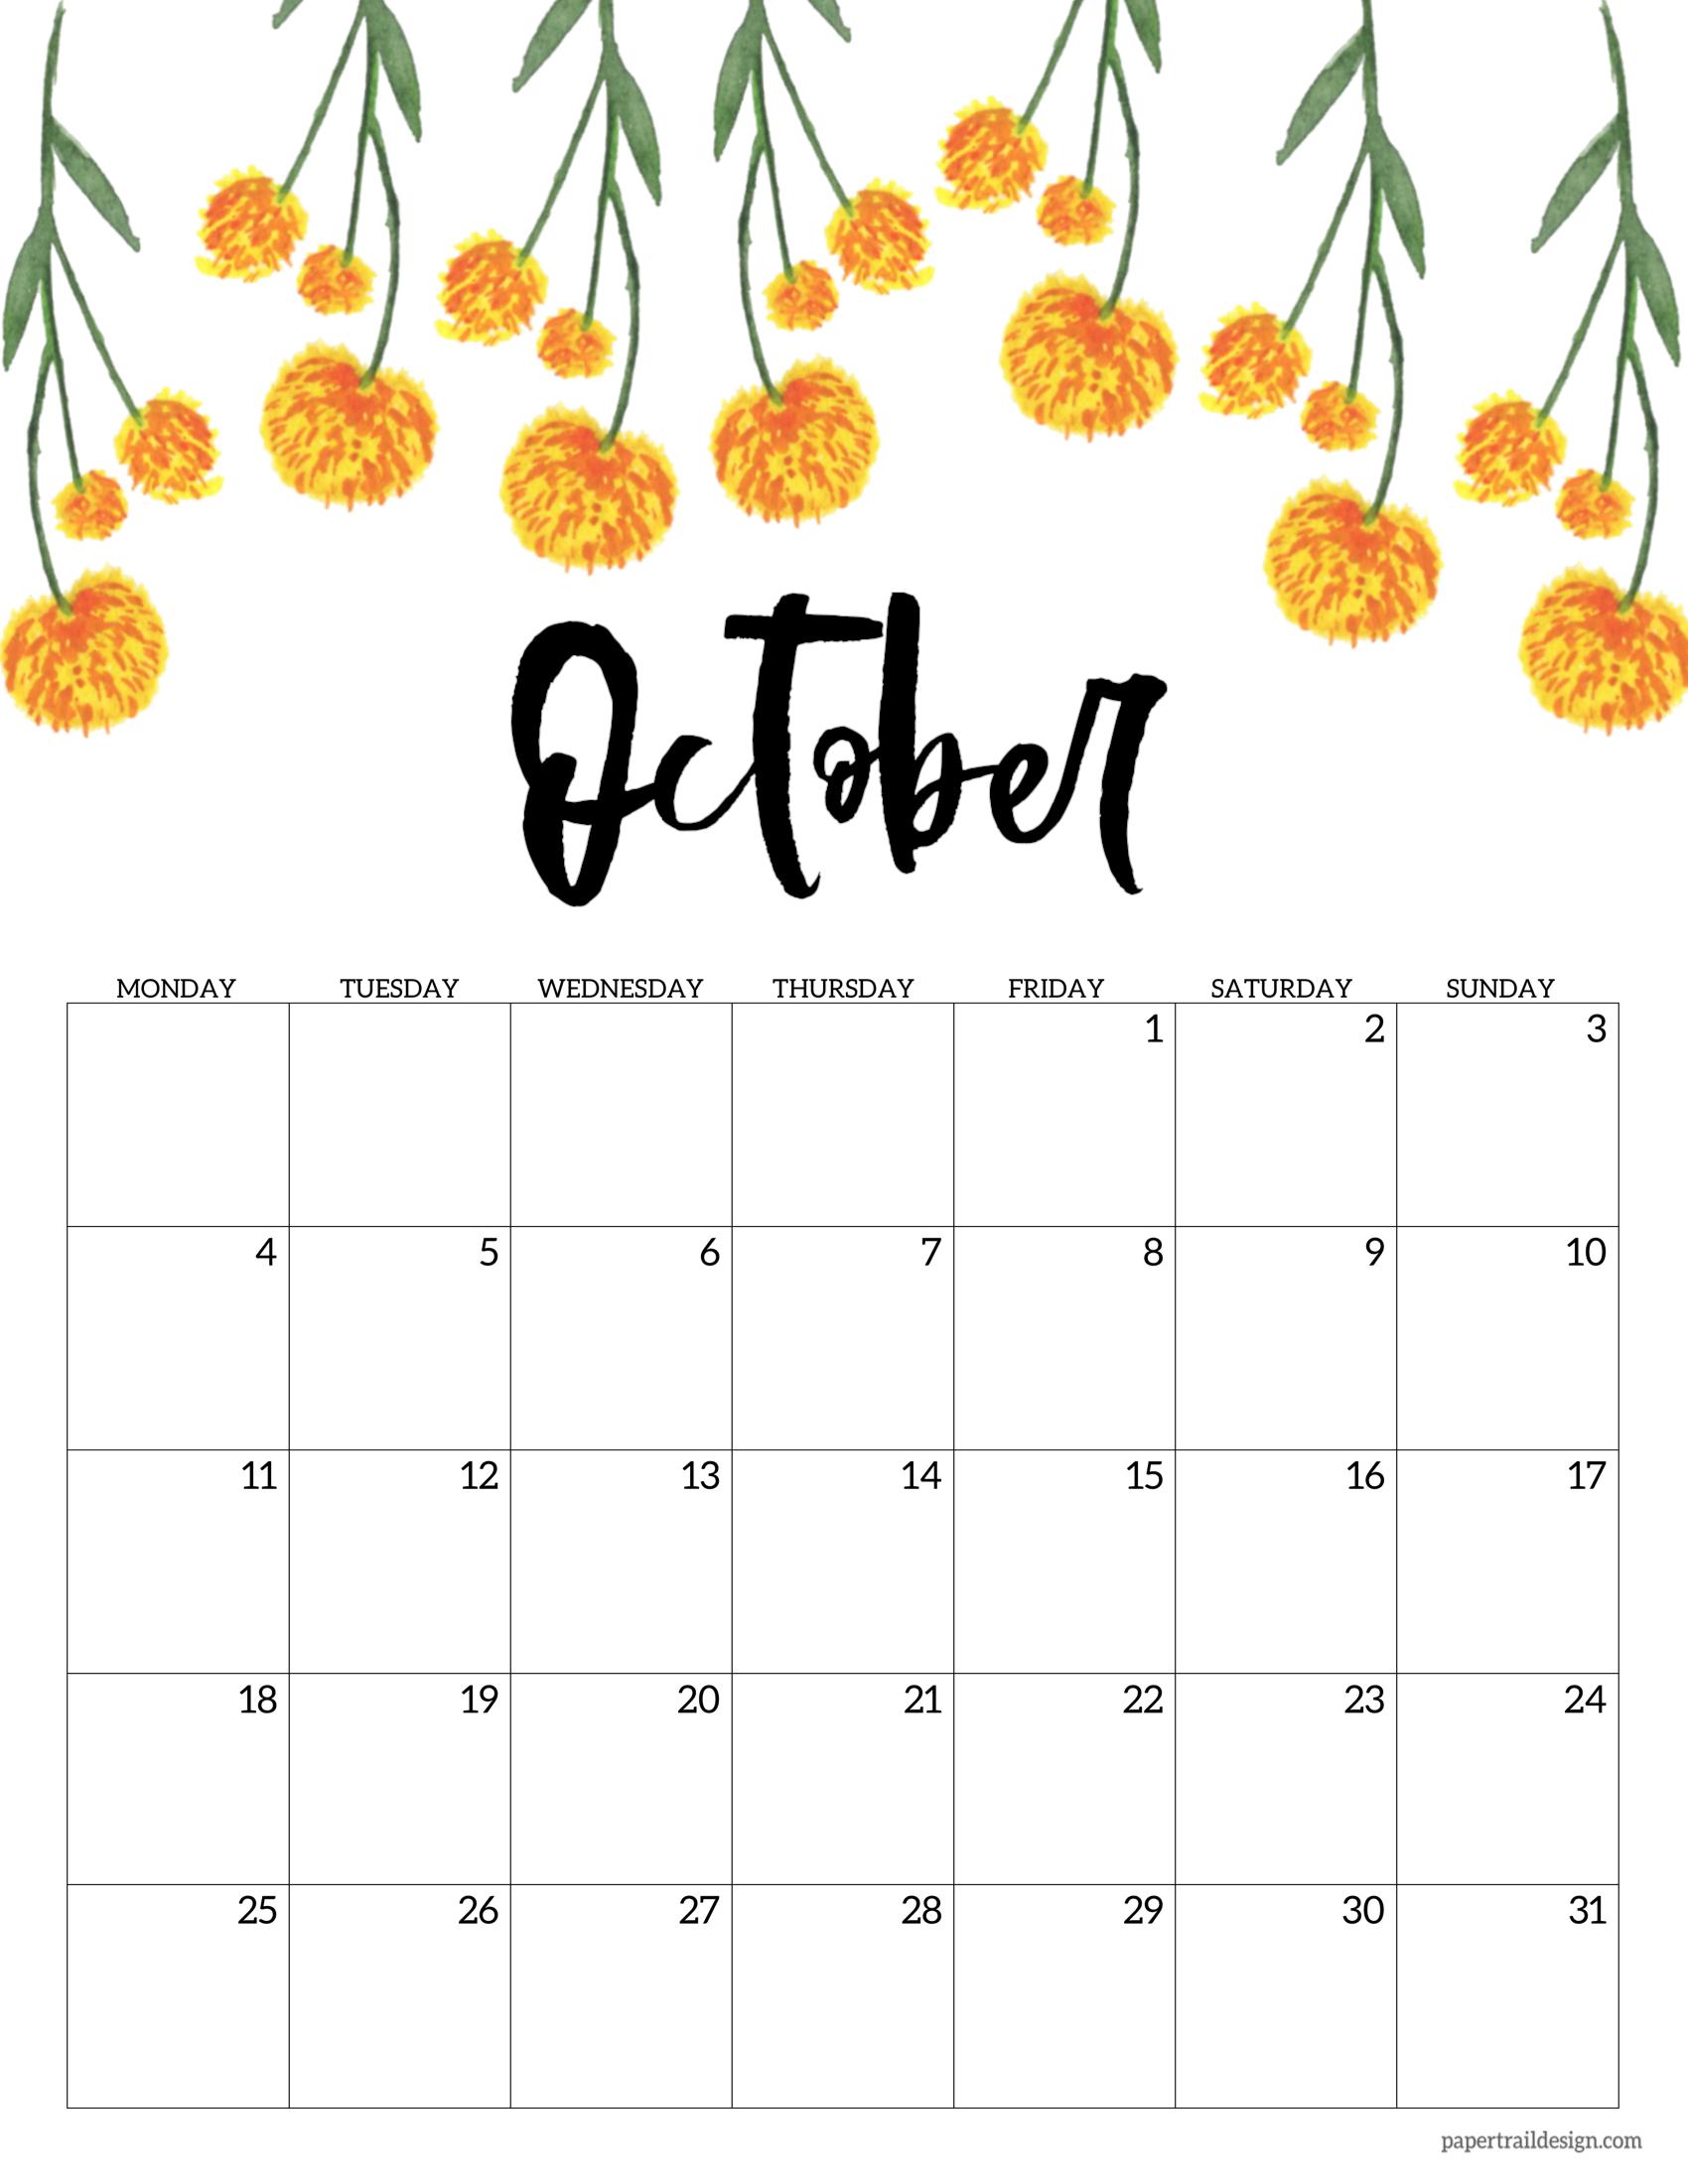 Free Printable 2021 Floral Calendar - Monday Start | Paper ...